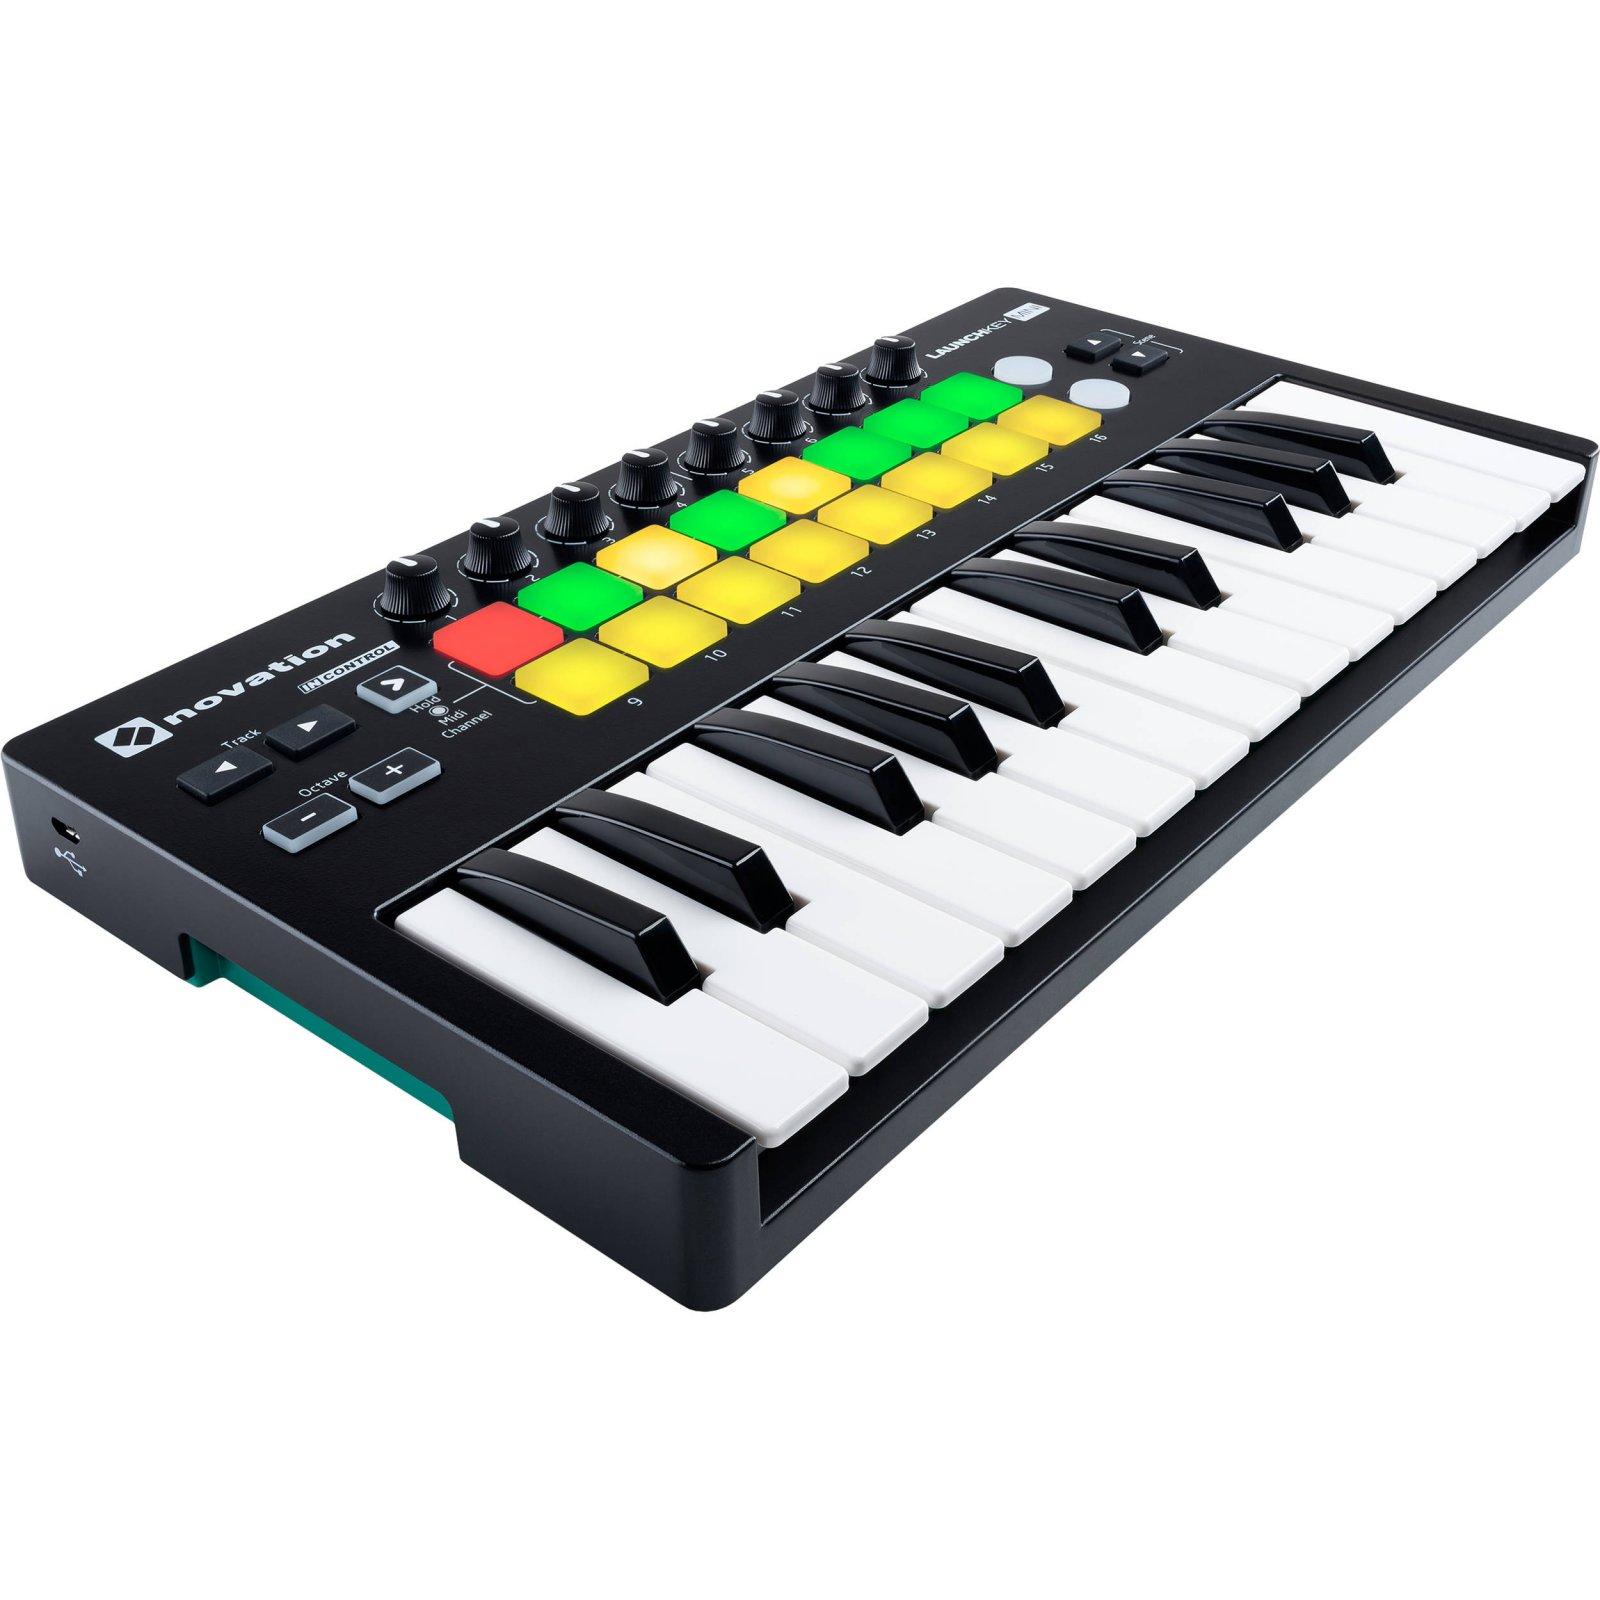 Novation Launchkey MK2 Mini 25-Note USB Keyboard Controller